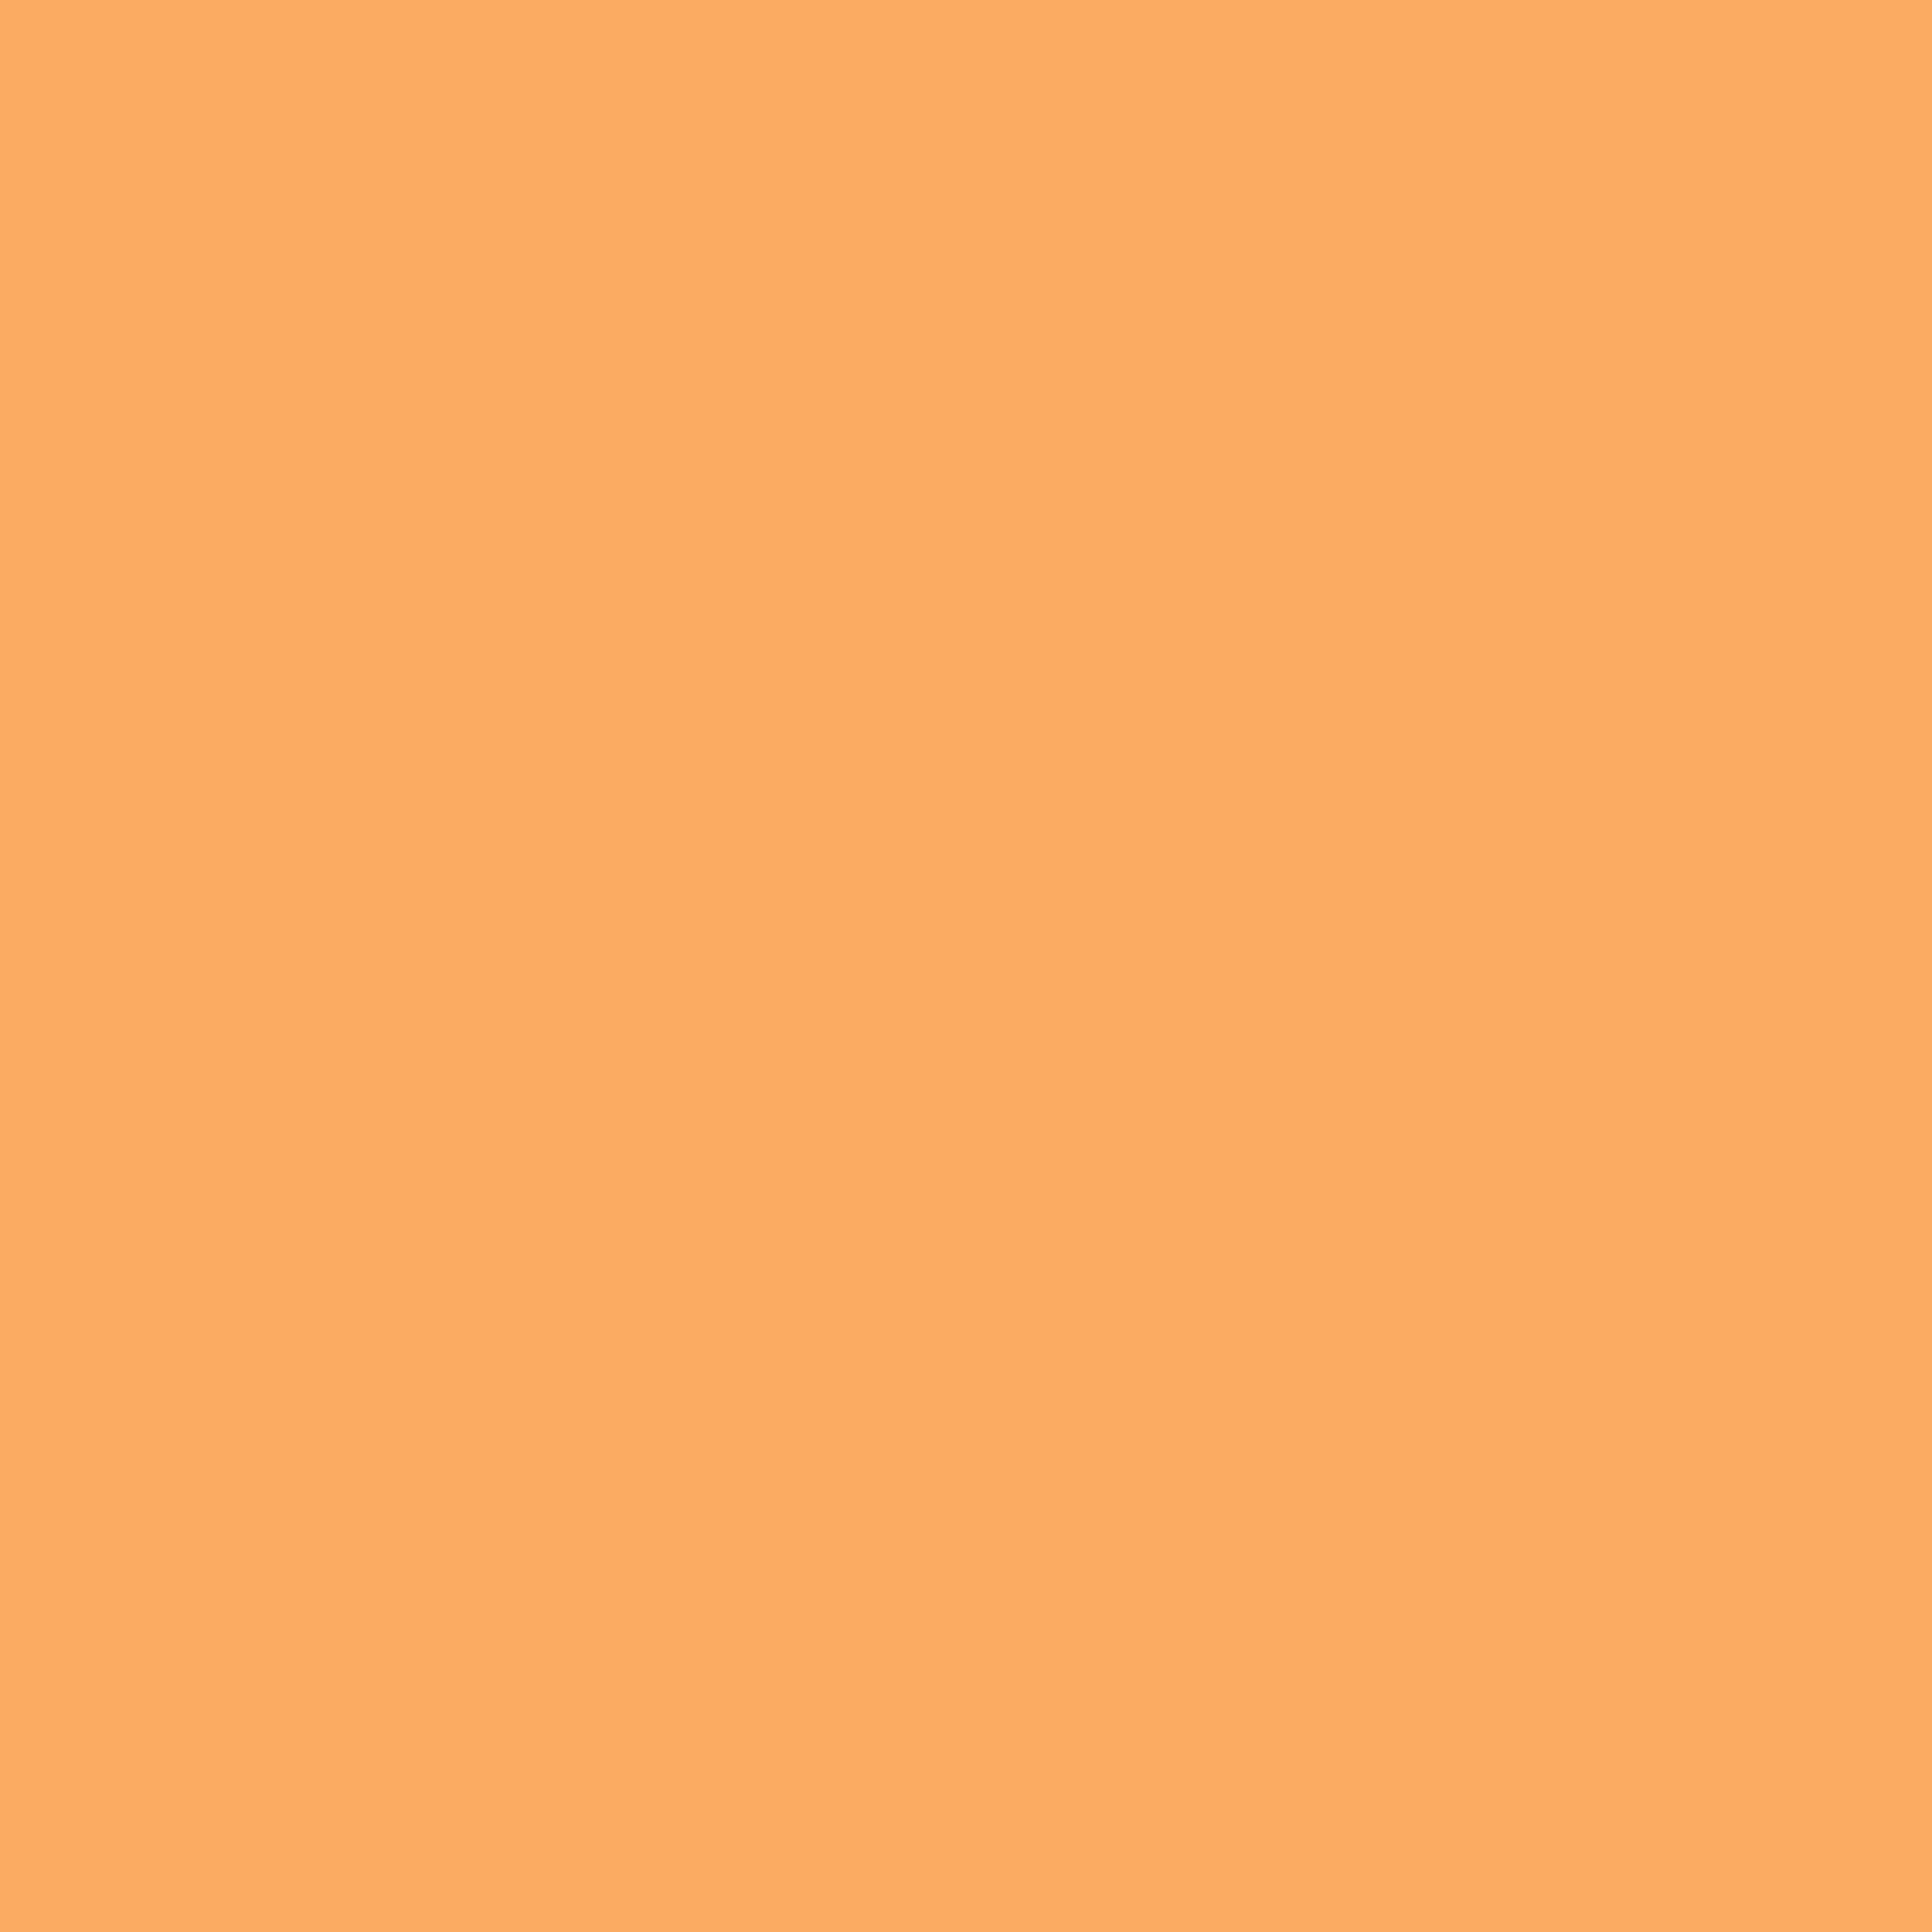 2732x2732 Rajah Solid Color Background